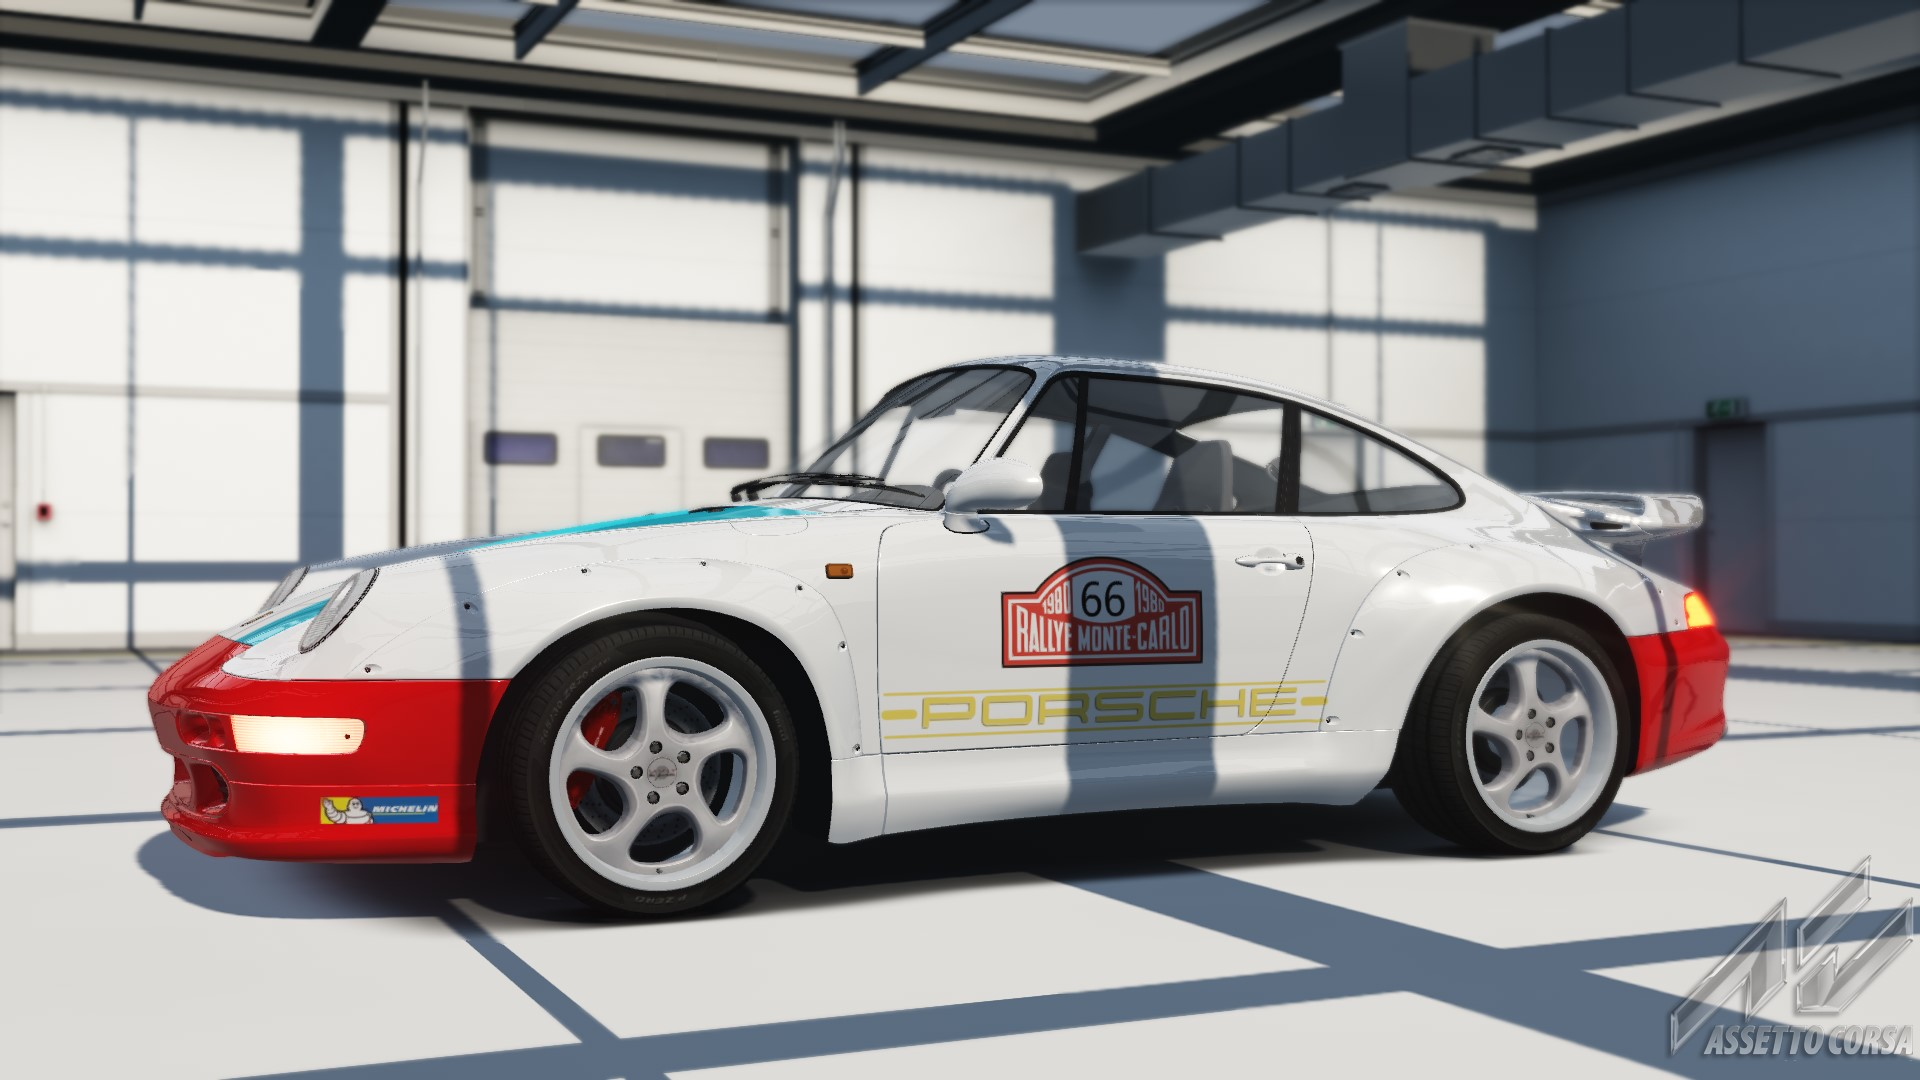 911 993 turbo porsche car detail assetto corsa database. Black Bedroom Furniture Sets. Home Design Ideas